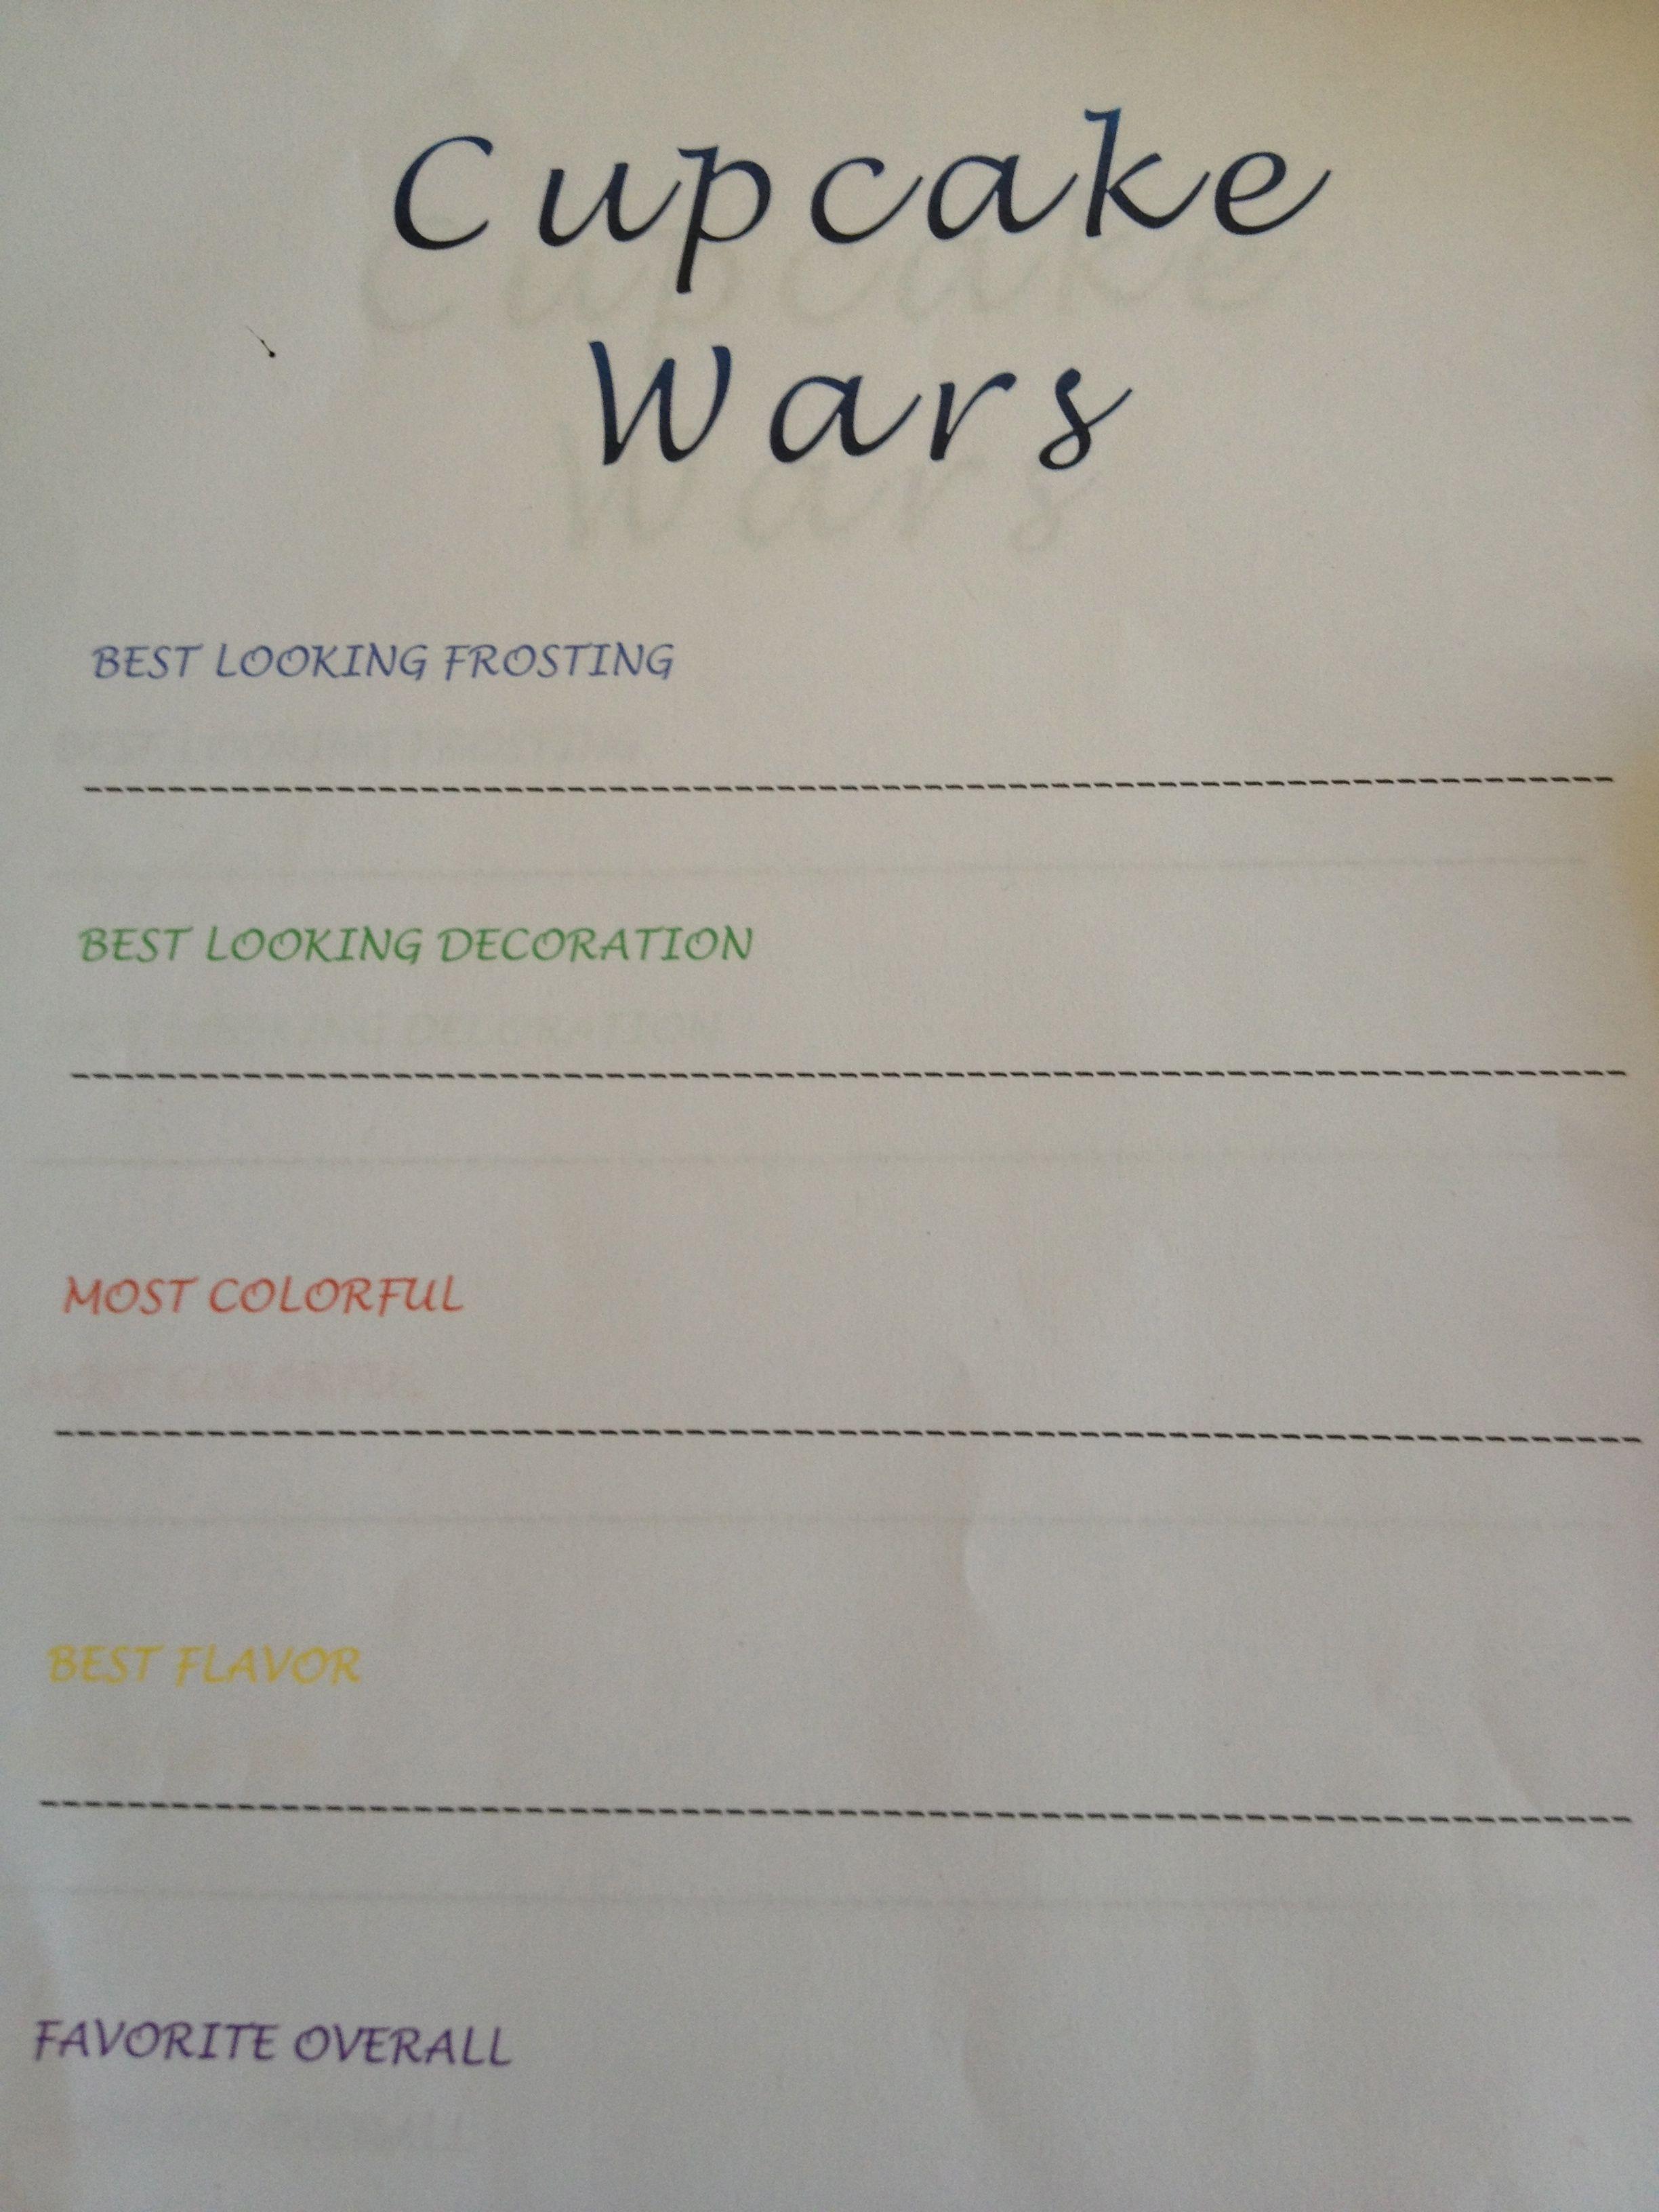 Cupcake Wars Judging Sheets